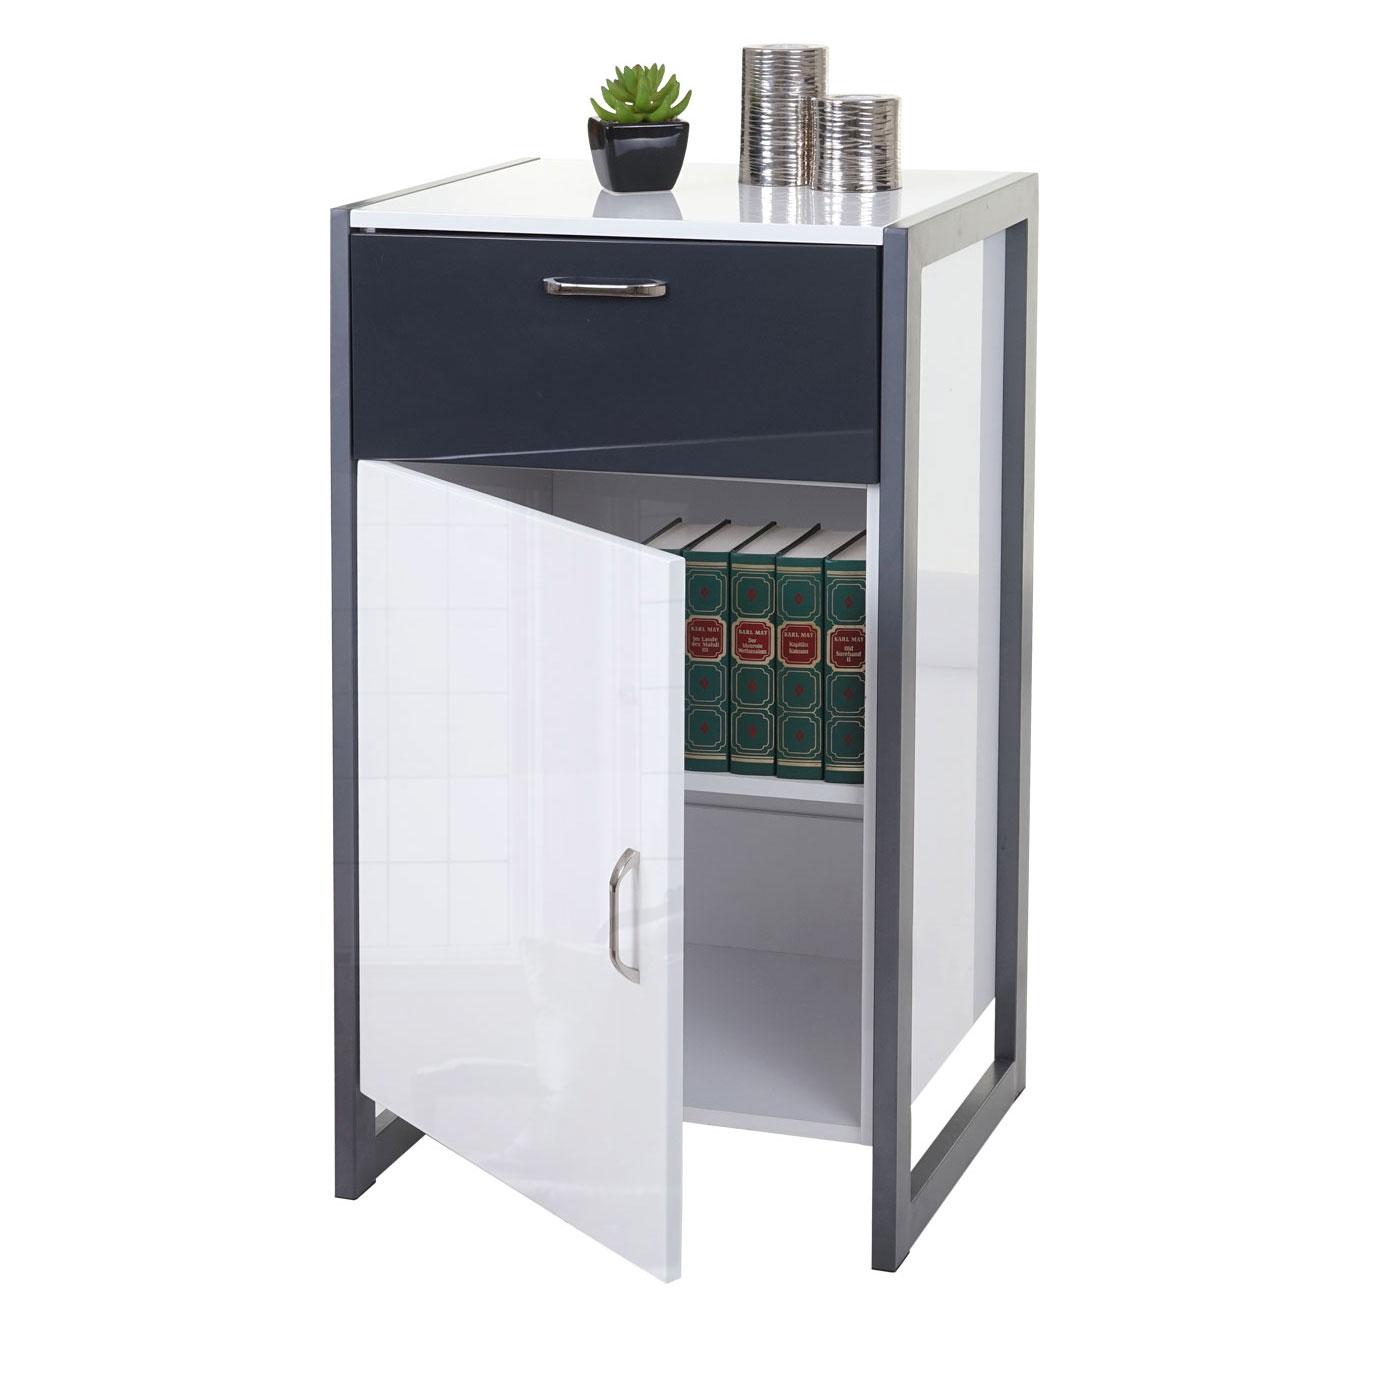 b ware kommode hwc b27 schubladenschrank hochglanz 90x50x40cm wei grau. Black Bedroom Furniture Sets. Home Design Ideas